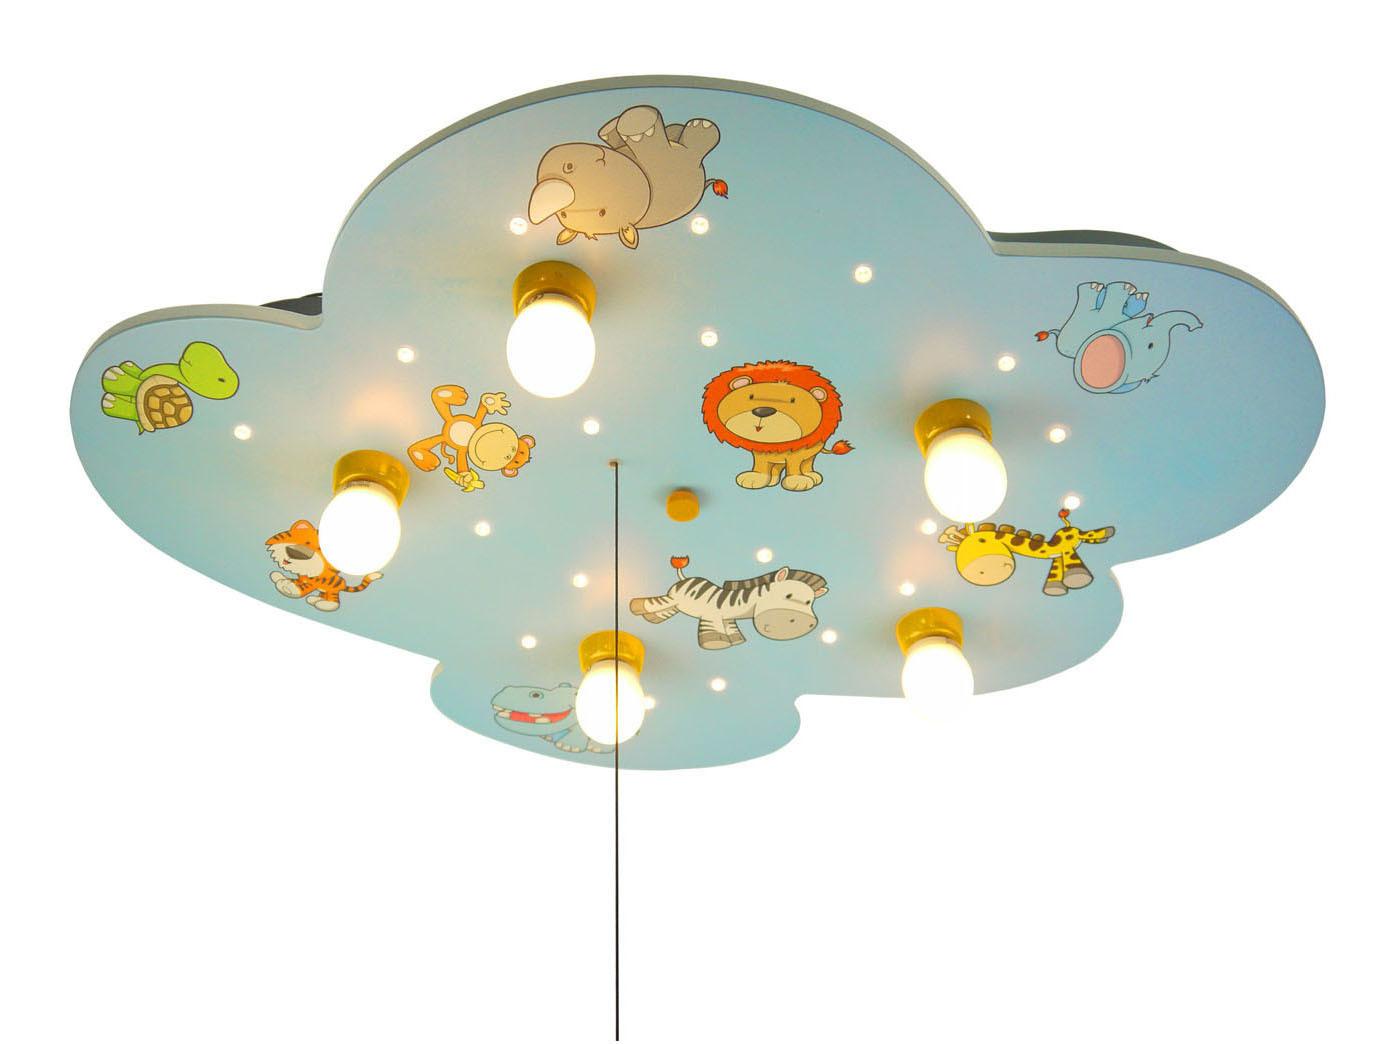 LED Lampe Kinderzimmer Wolkenlampe LED Sternenhimmel Schlummerlicht ...